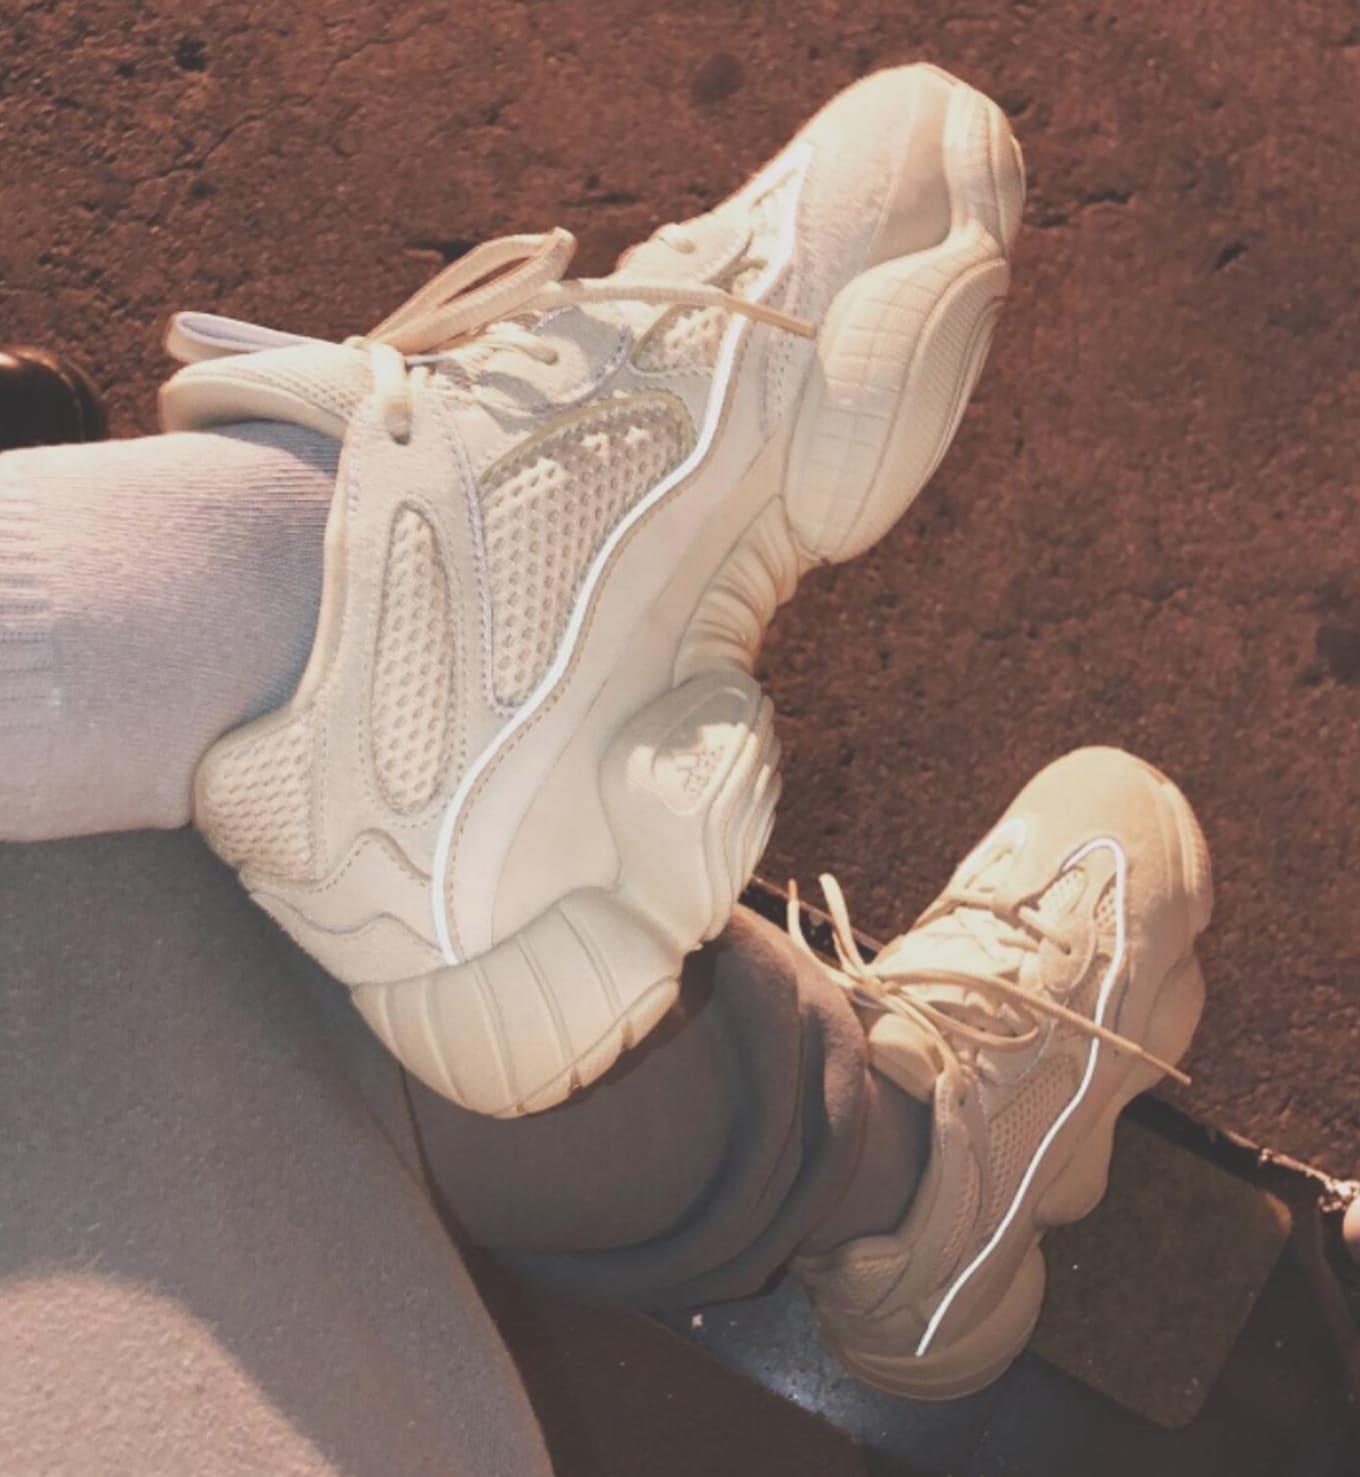 6d397a5d144a0 Kim Kardashian Previews  Mud Rat  Adidas Yeezy 500s